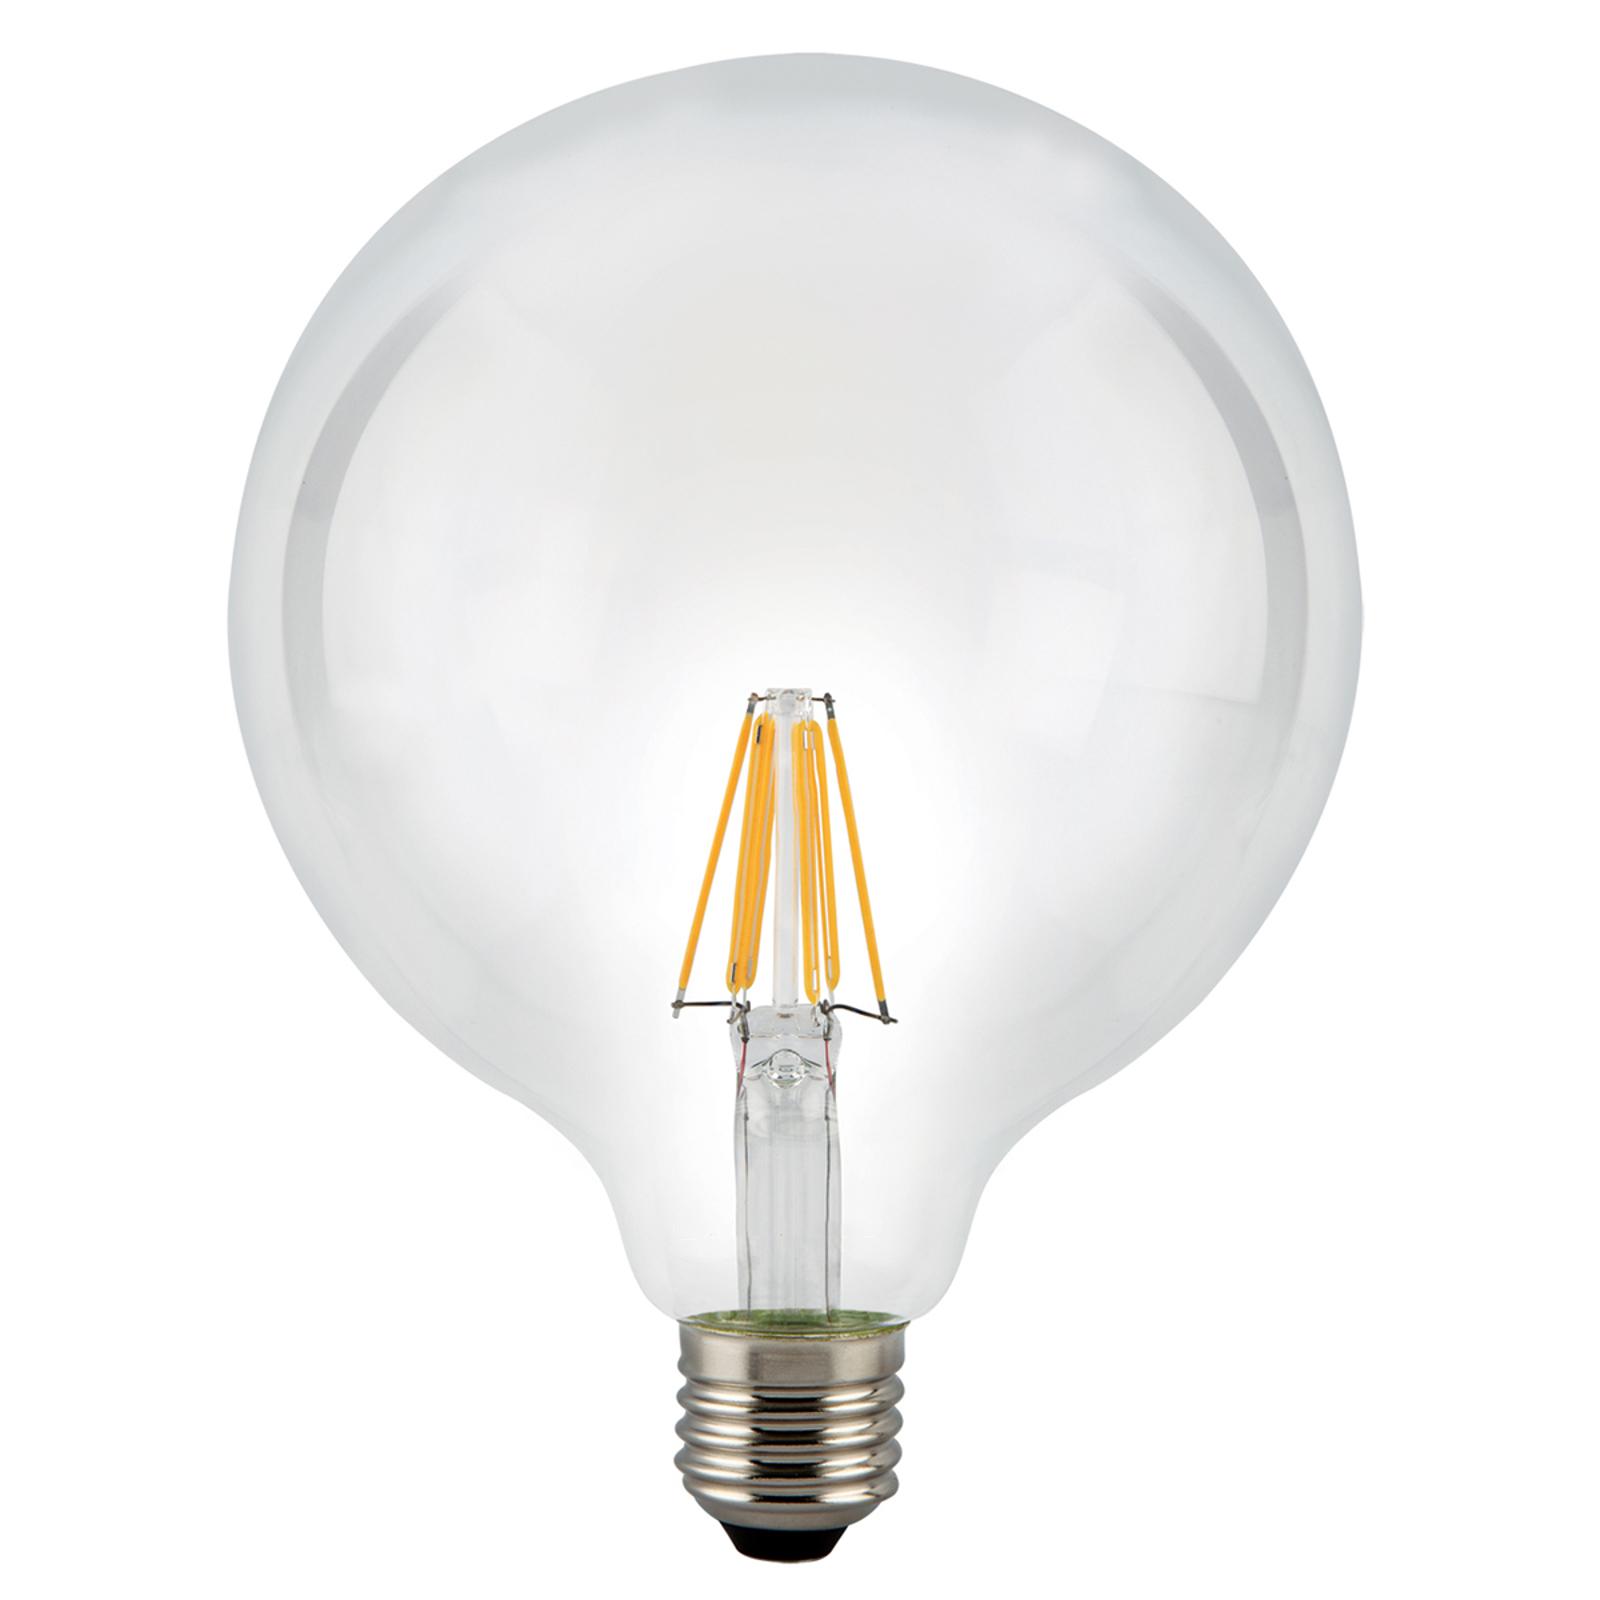 LED-Globelampe E27 8W 827 klar